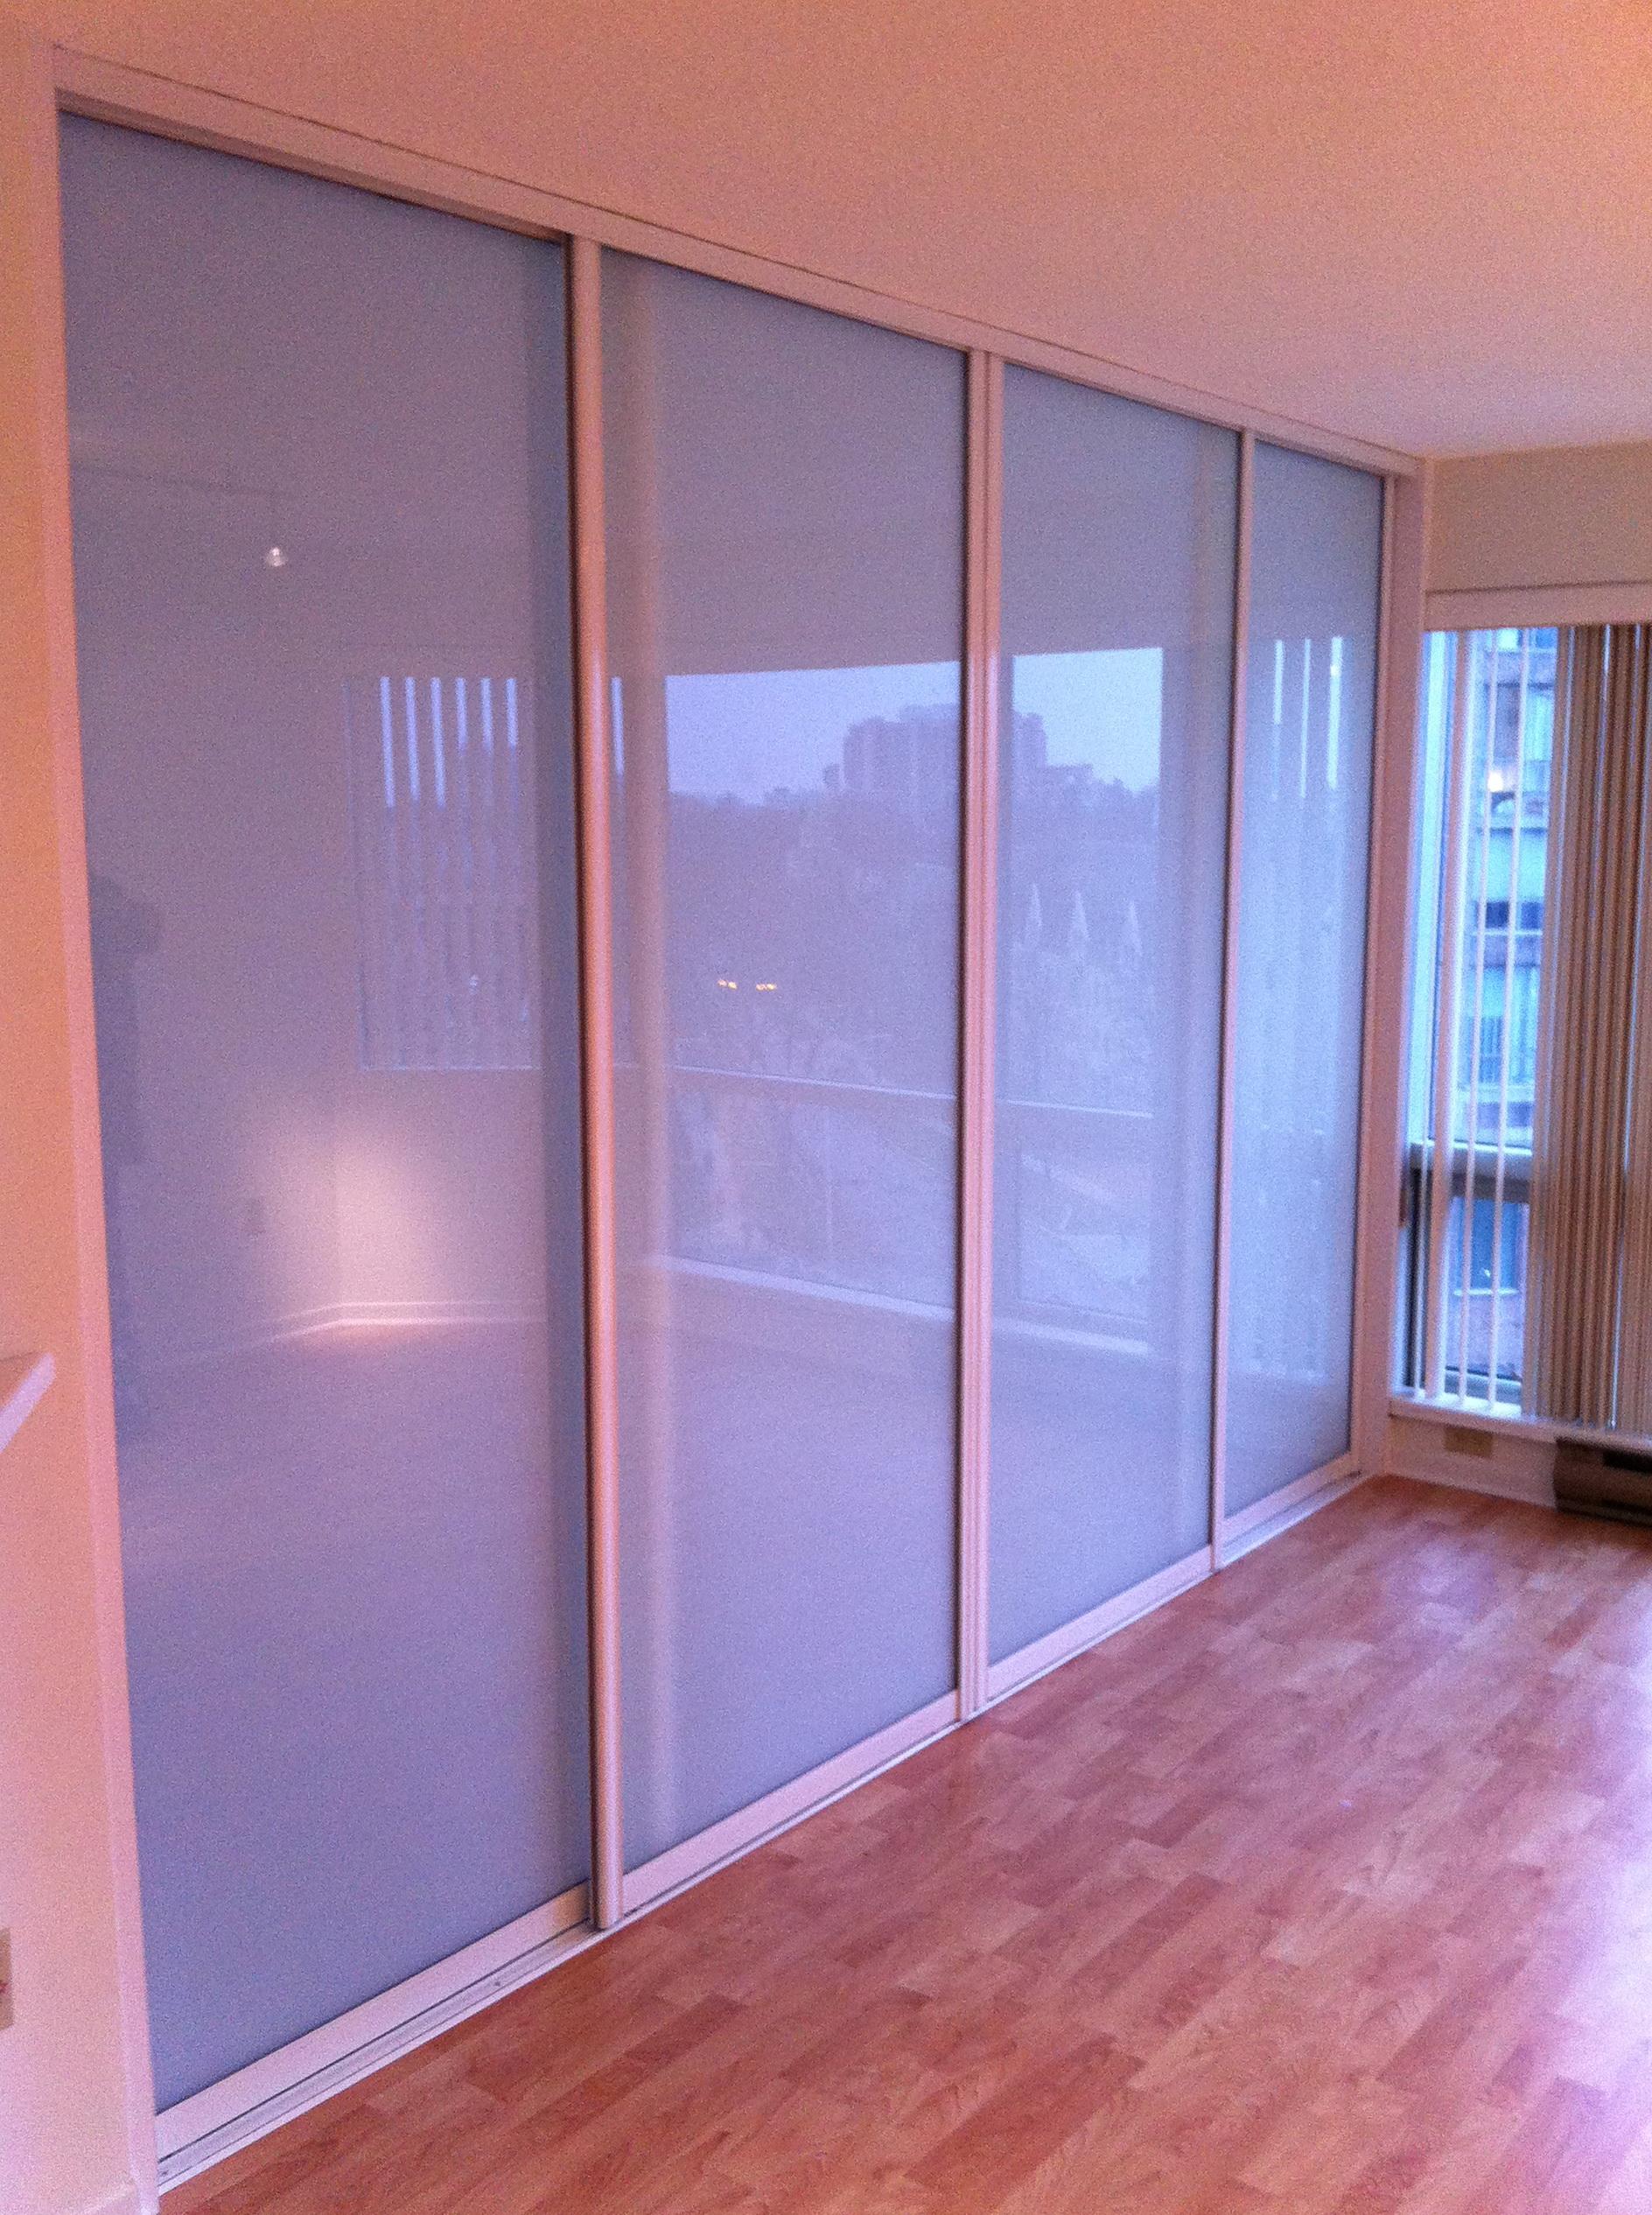 8 foot bifold closet doors home design ideas. Black Bedroom Furniture Sets. Home Design Ideas